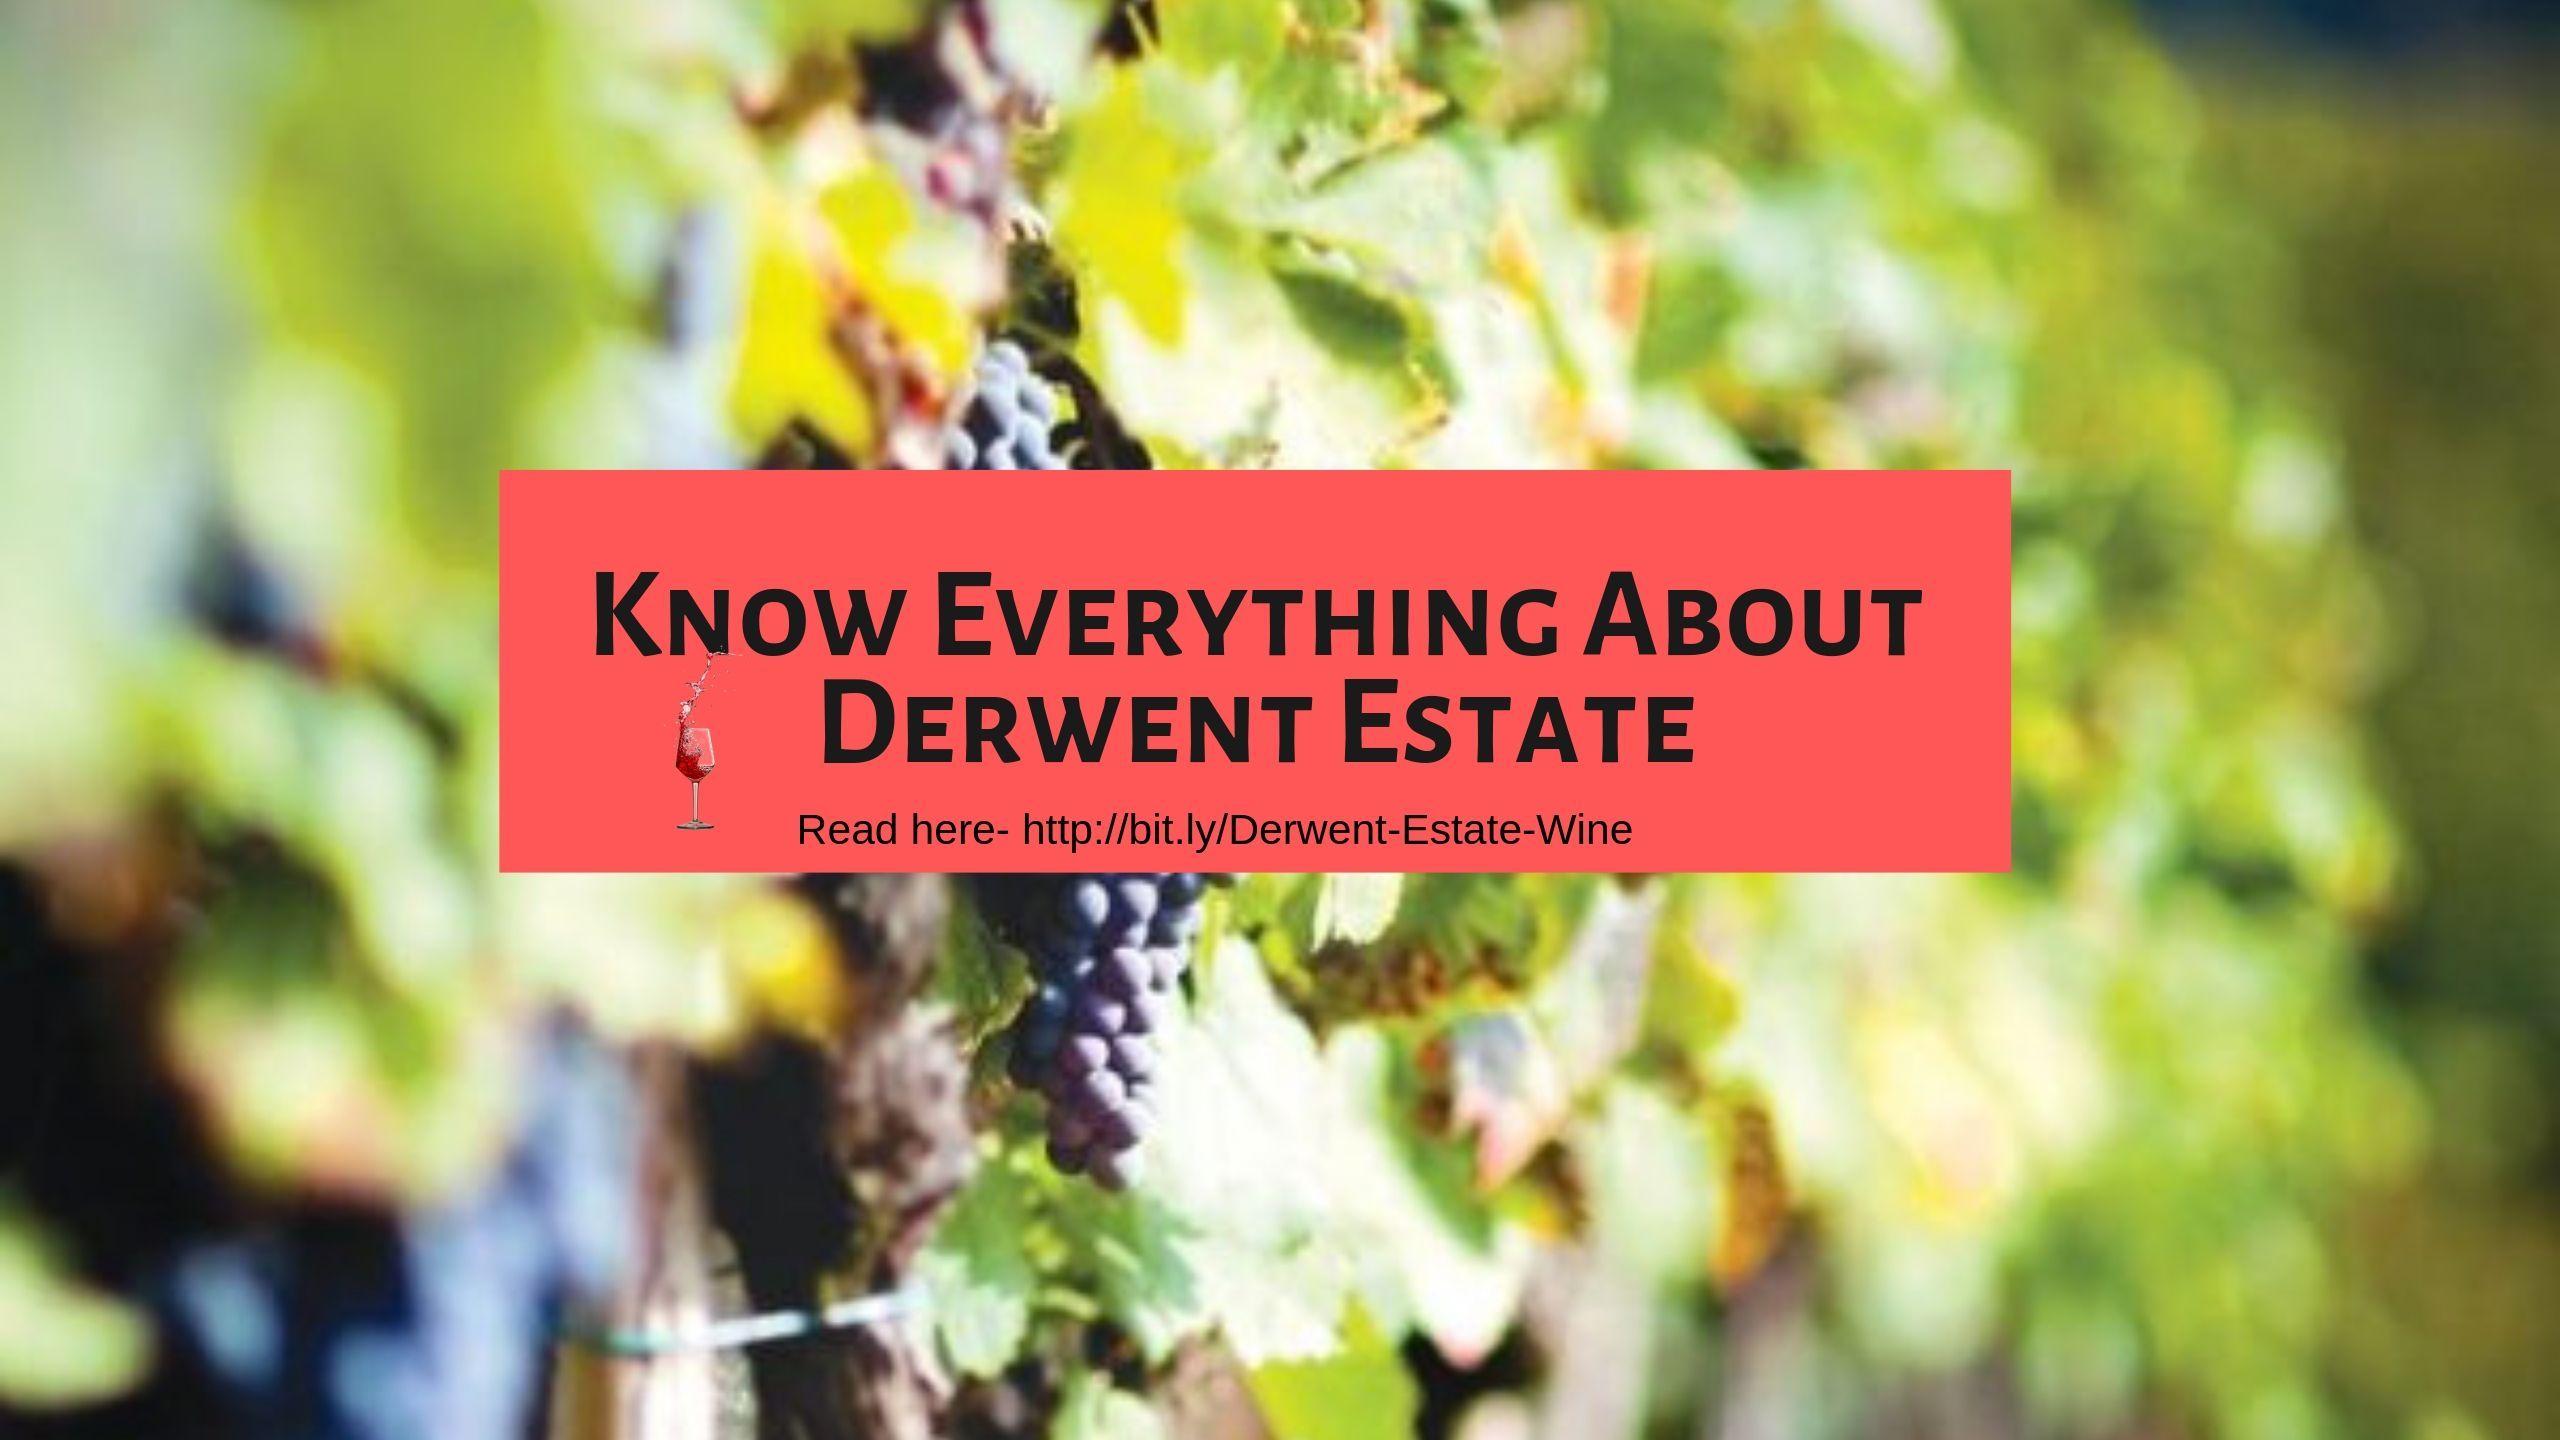 Derwent Estate Wines Lettering Wines Reading